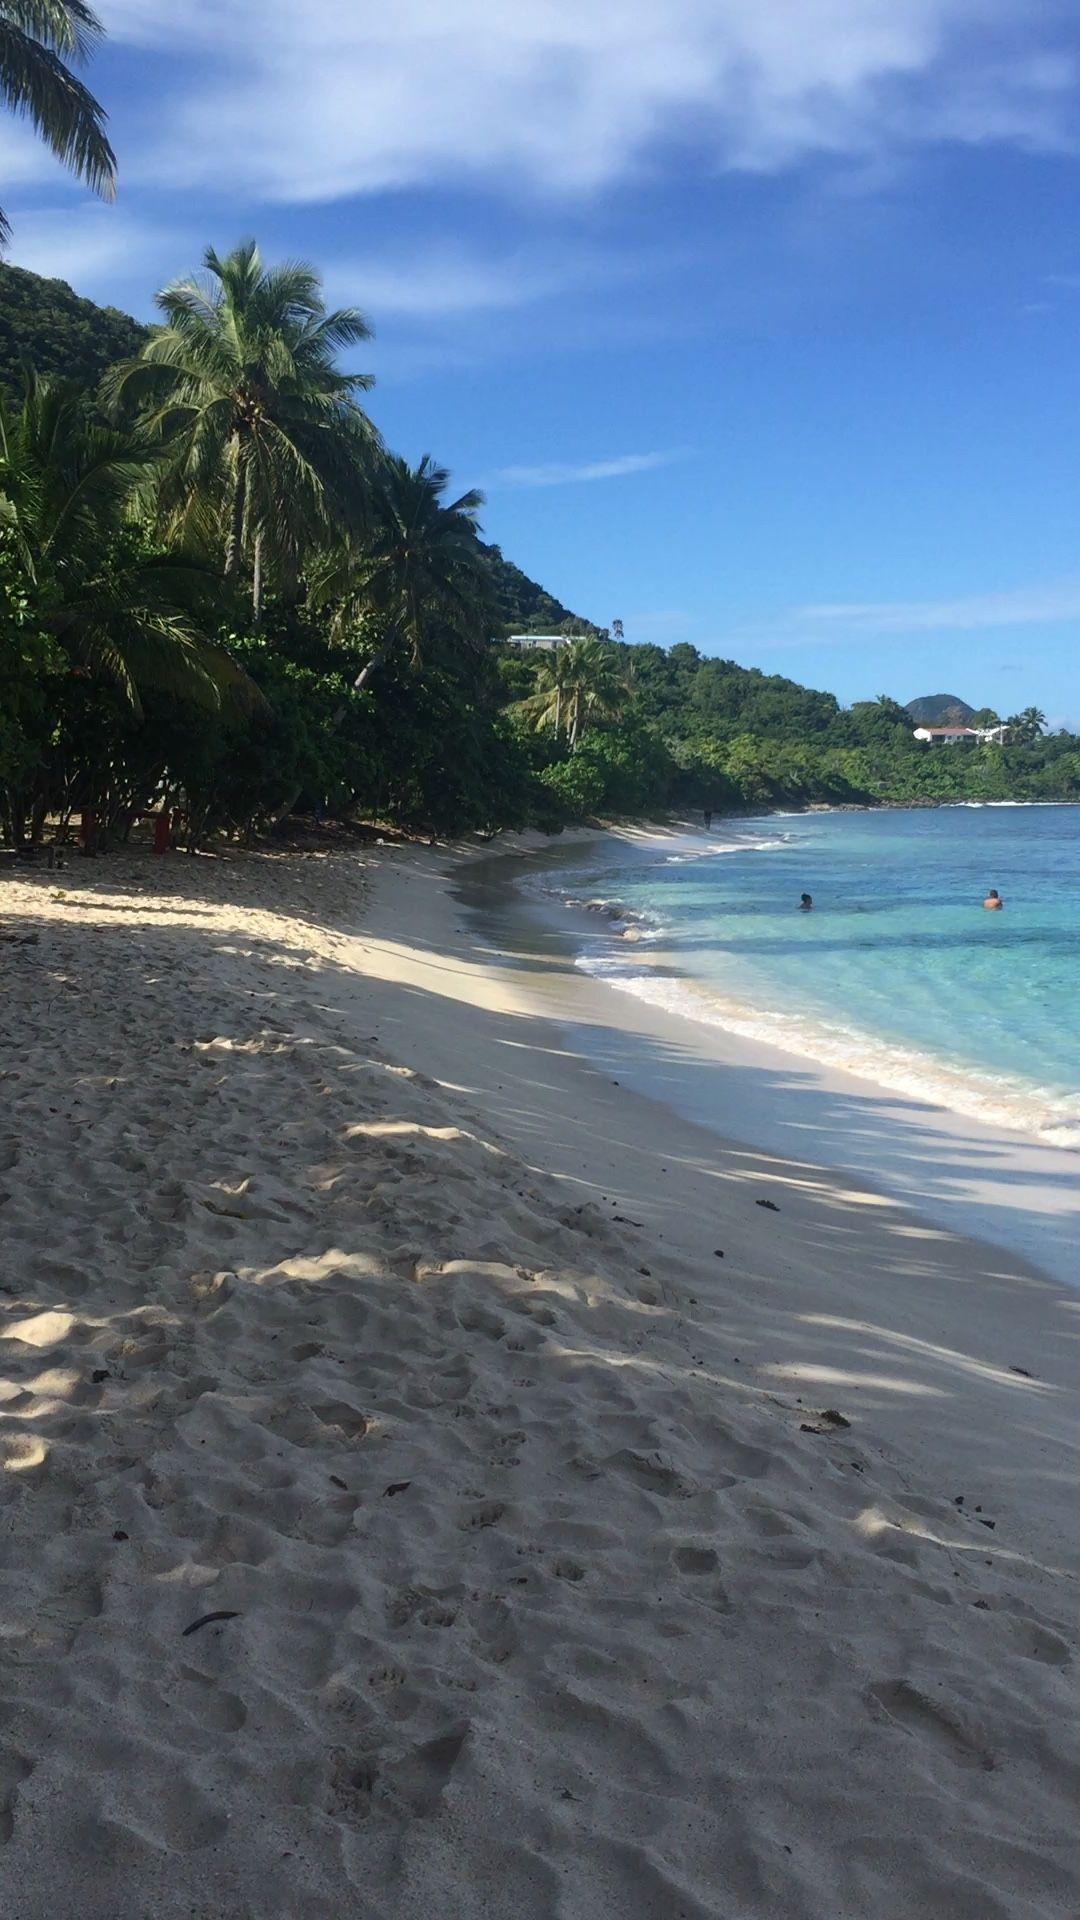 Beautiful beach at Smuggler's Cove, Tortola, BVI Eastern